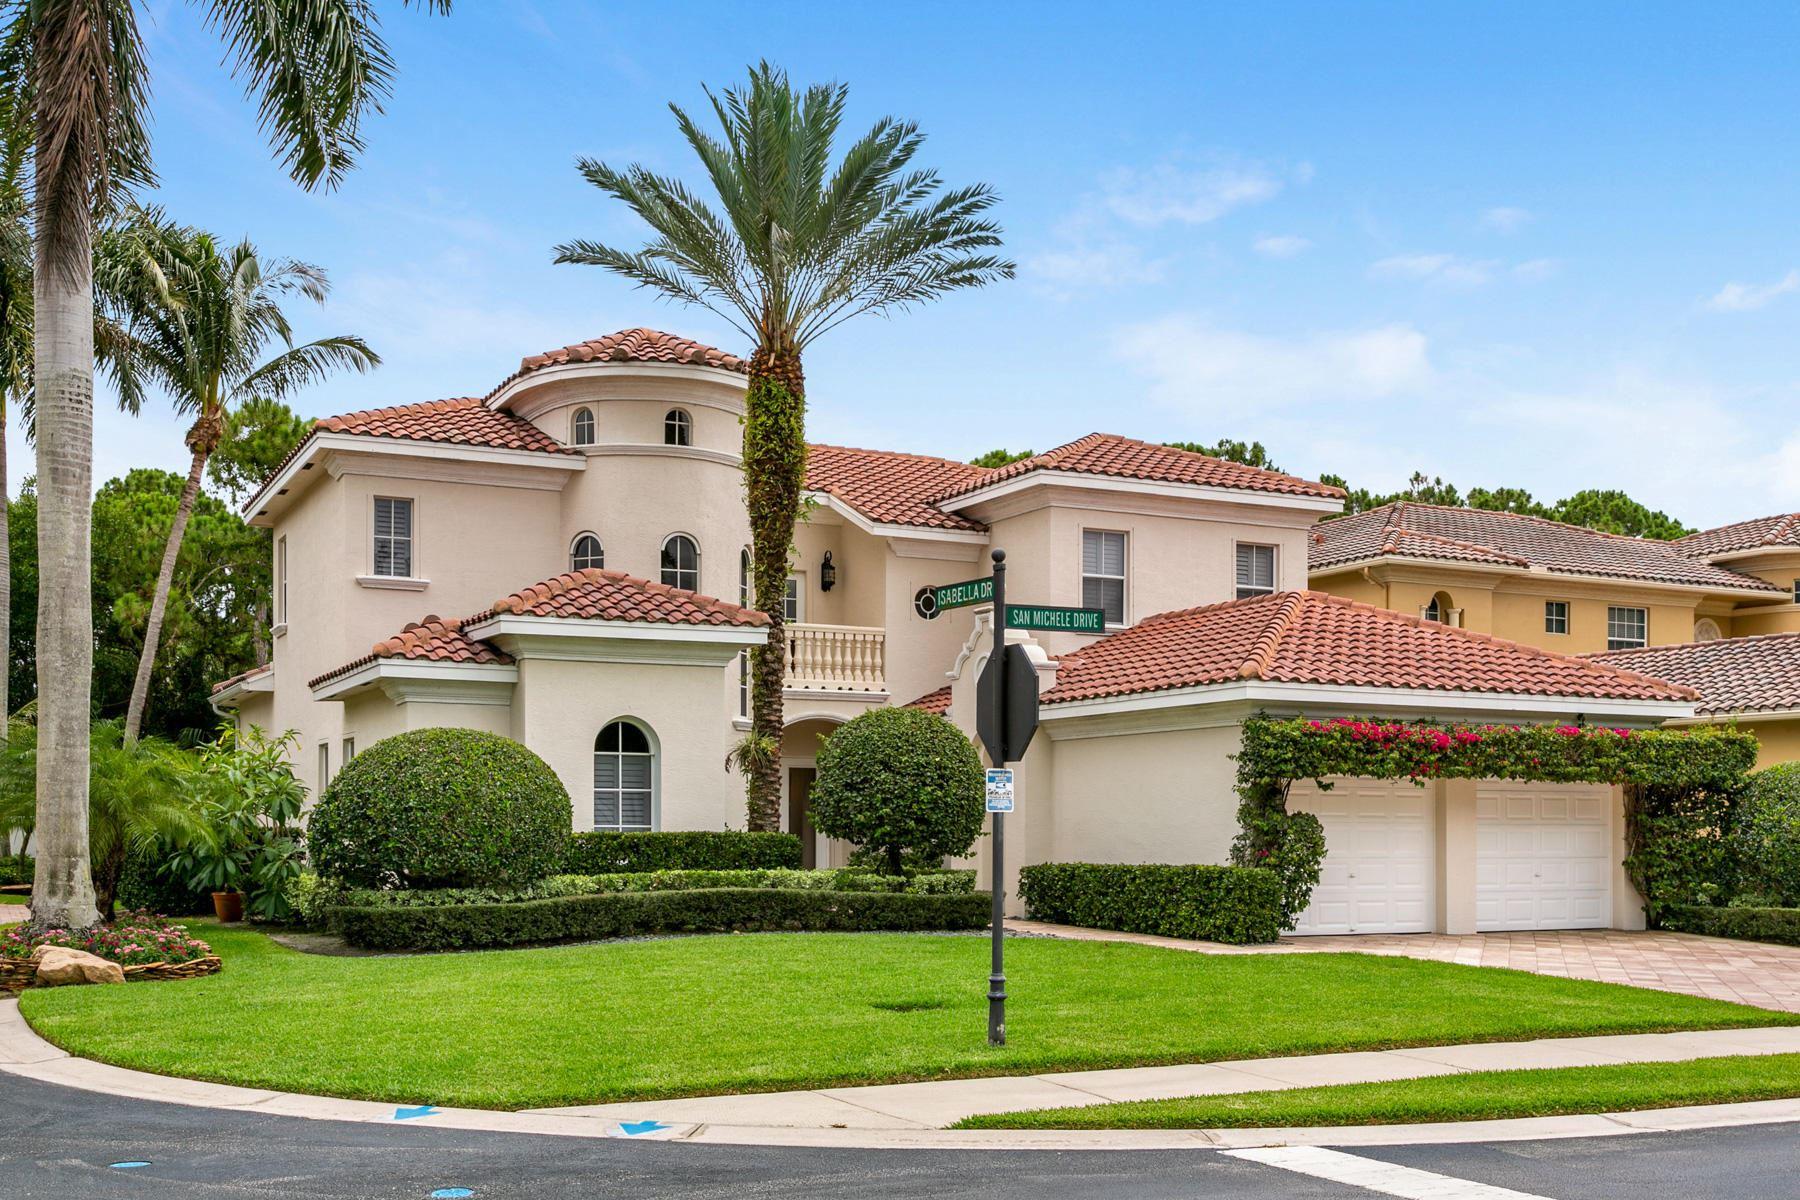 3158 San Michele Drive, Palm Beach Gardens, FL 33418 - #: RX-10726627